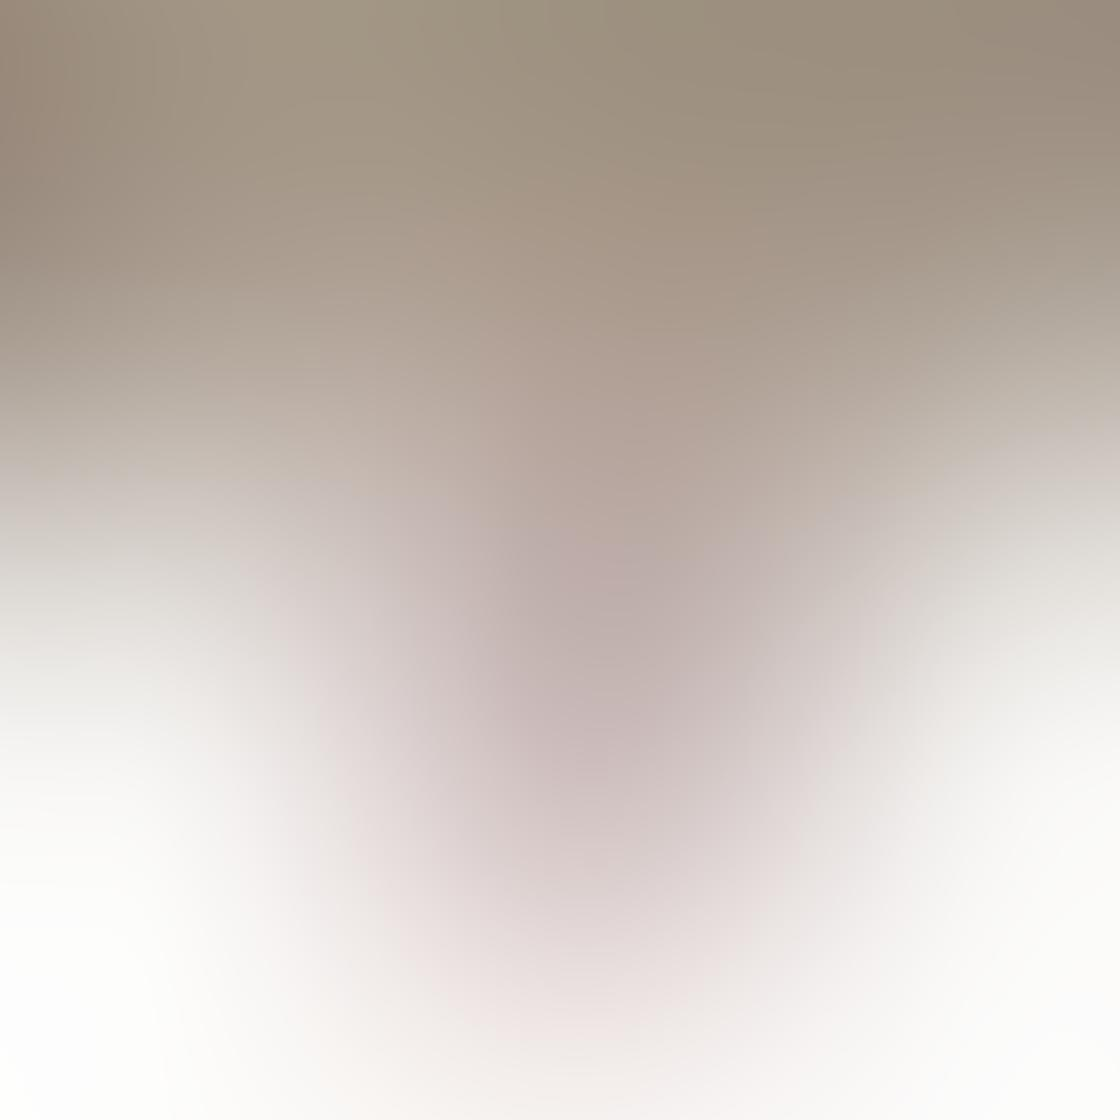 iPhone Photography Snow 104